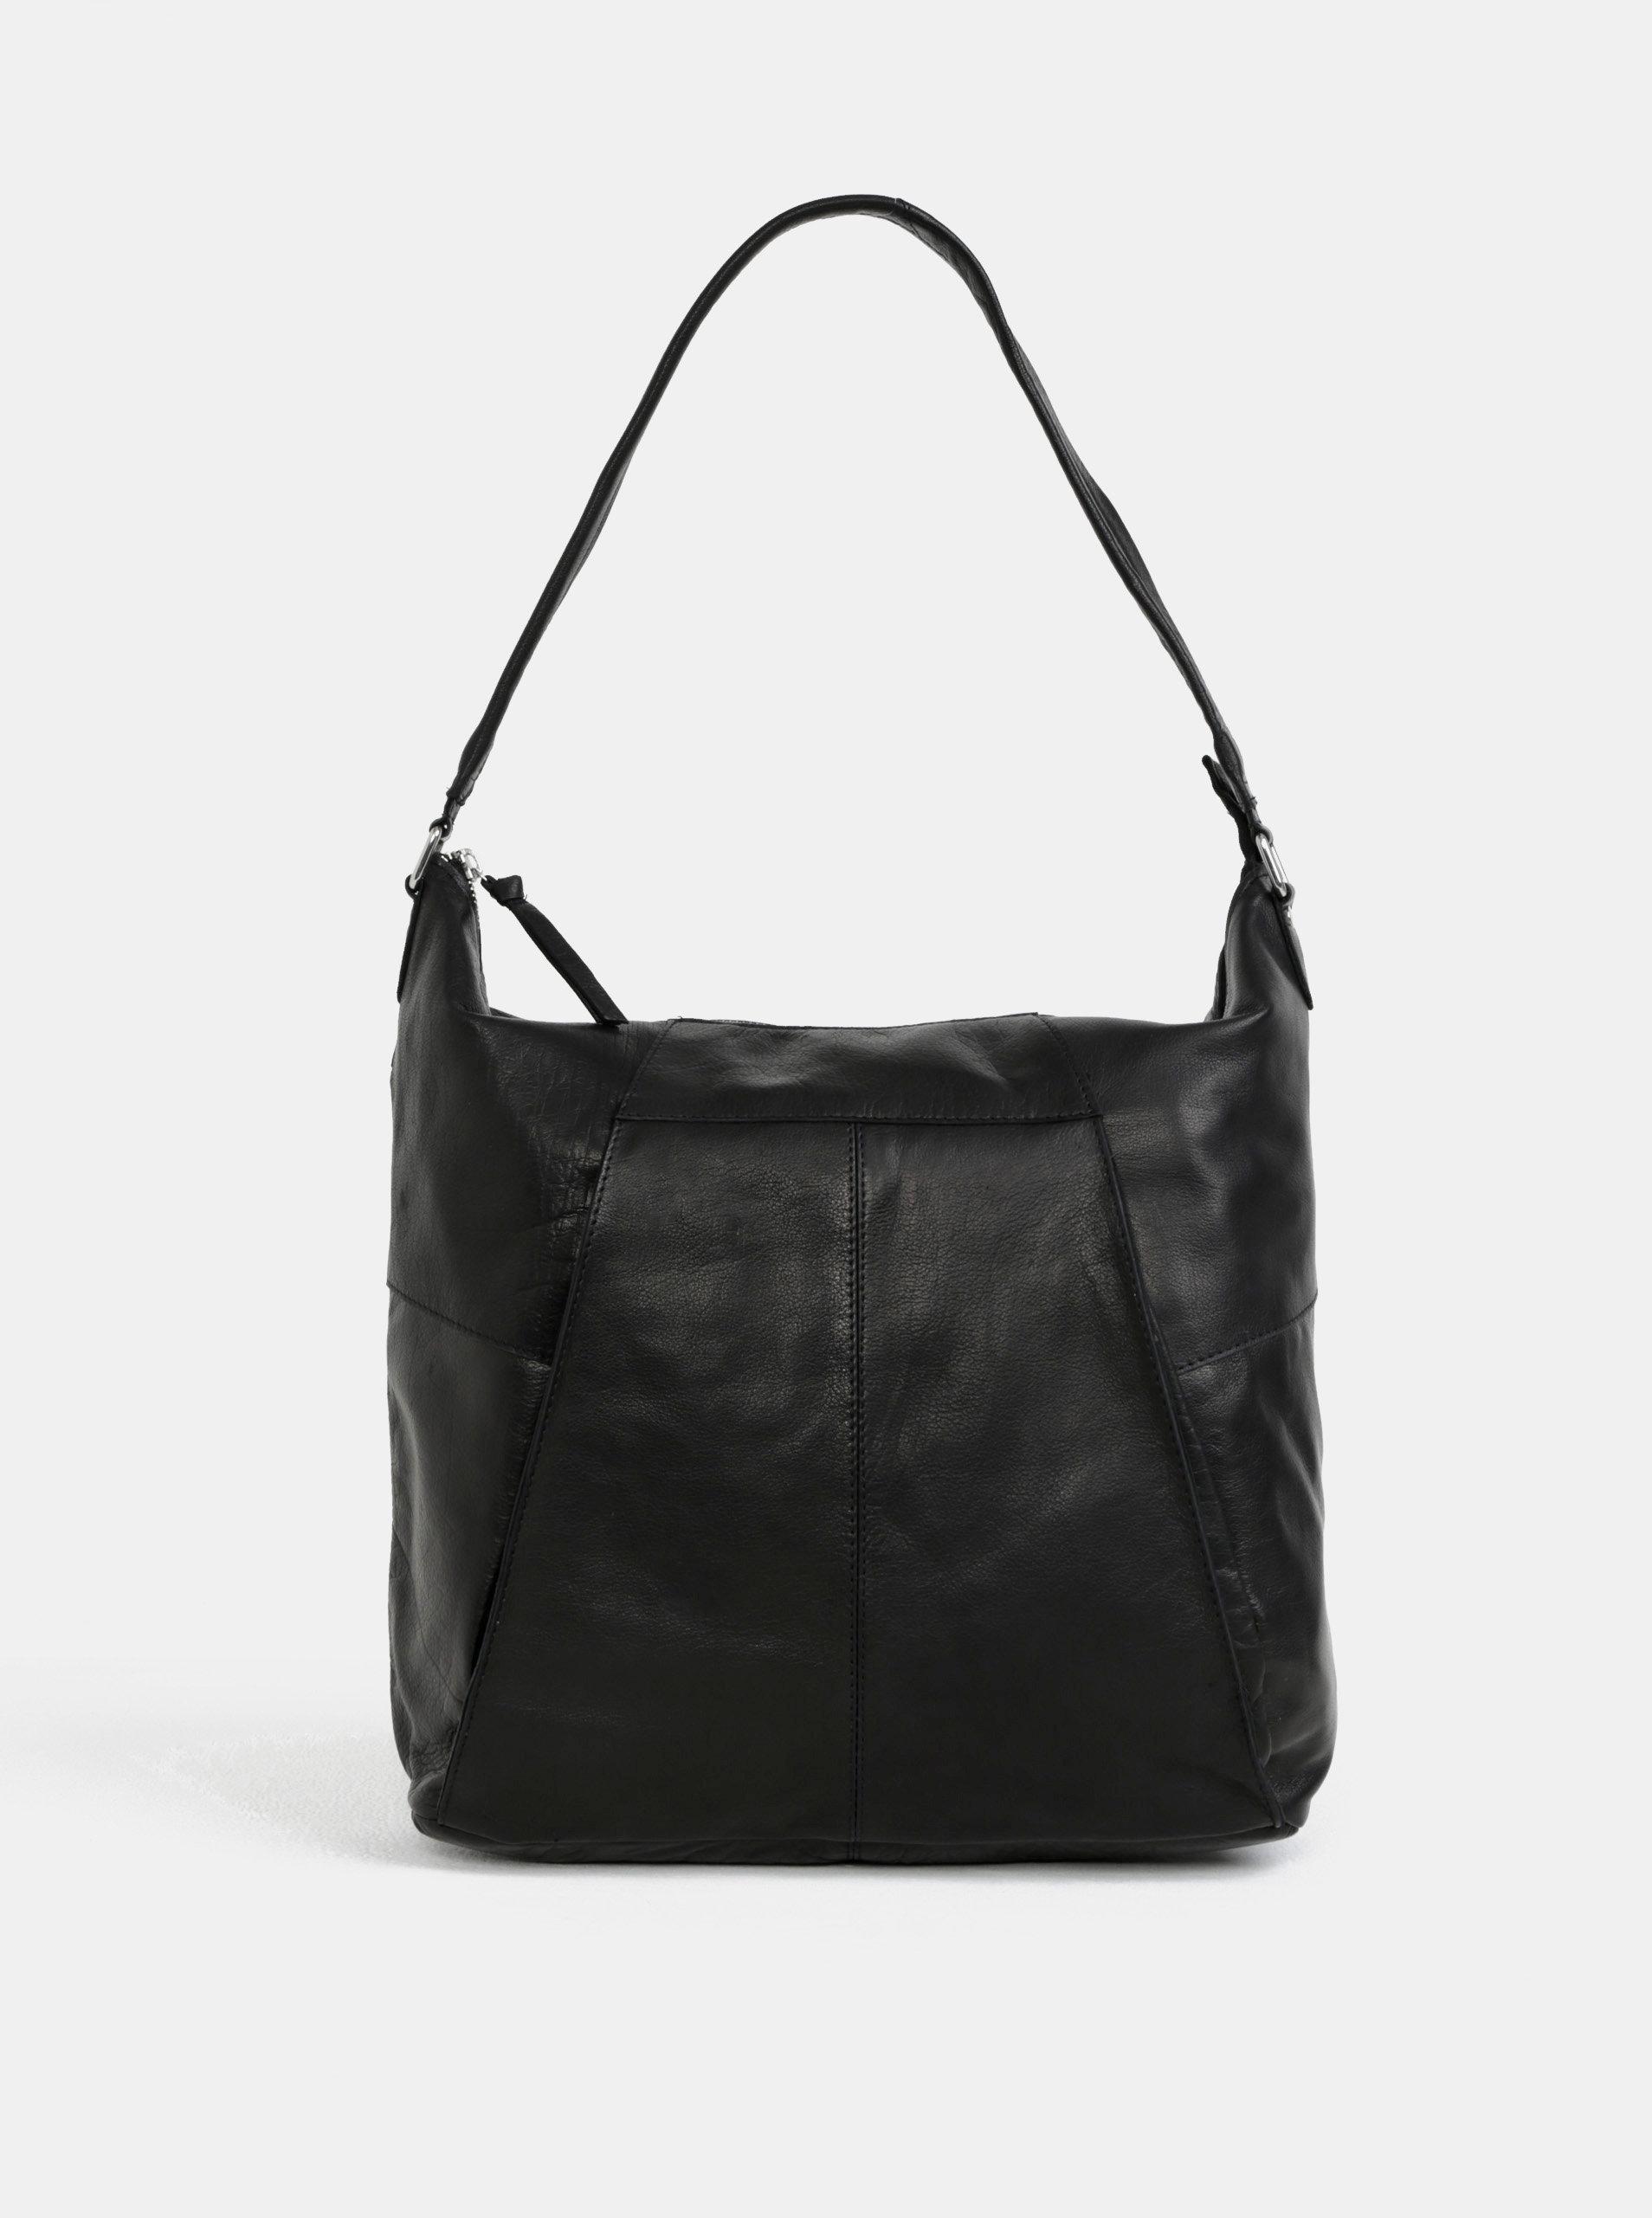 cb0703d29a Černá kožená kabelka přes rameno Pieces Dehbra ...